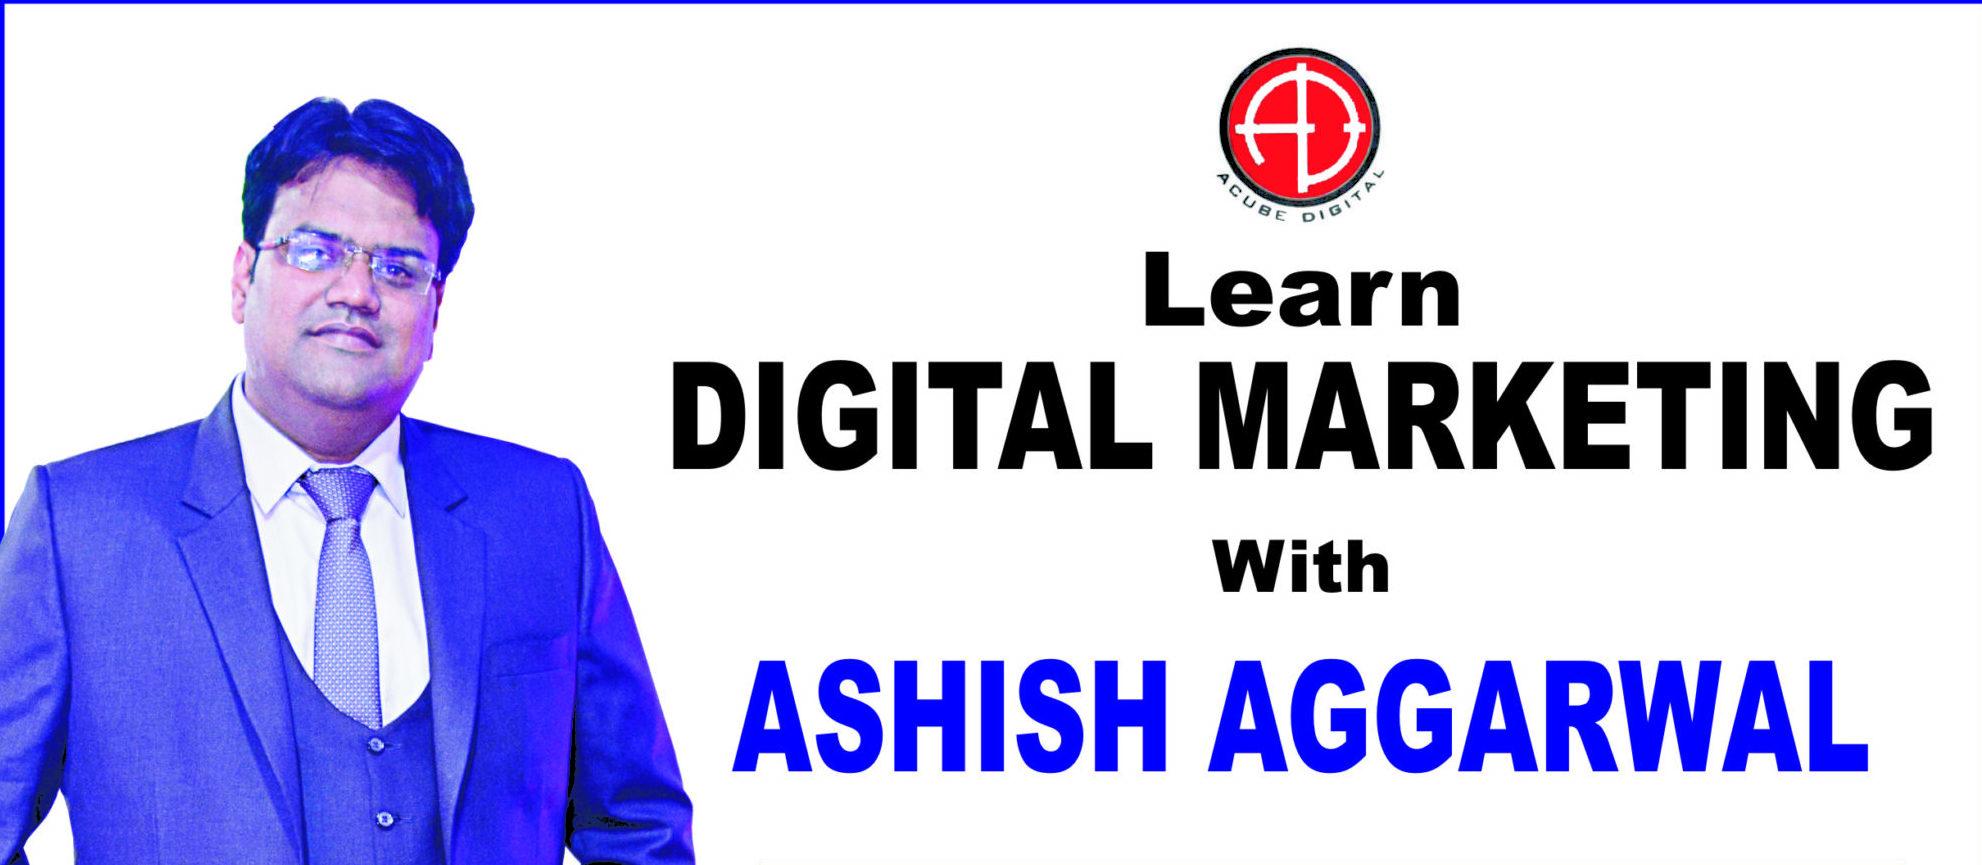 ashish aggarwal